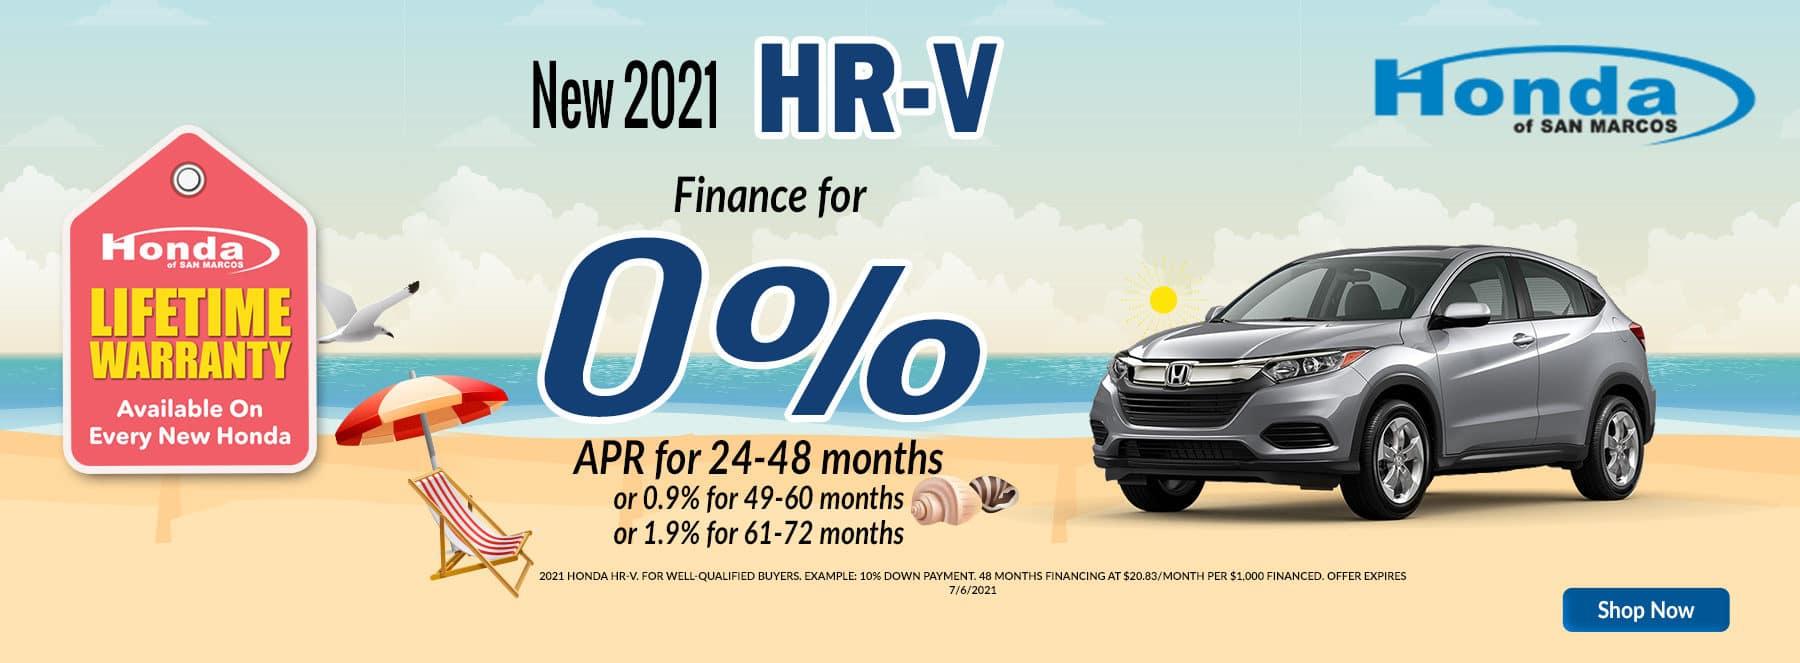 2021 HRV